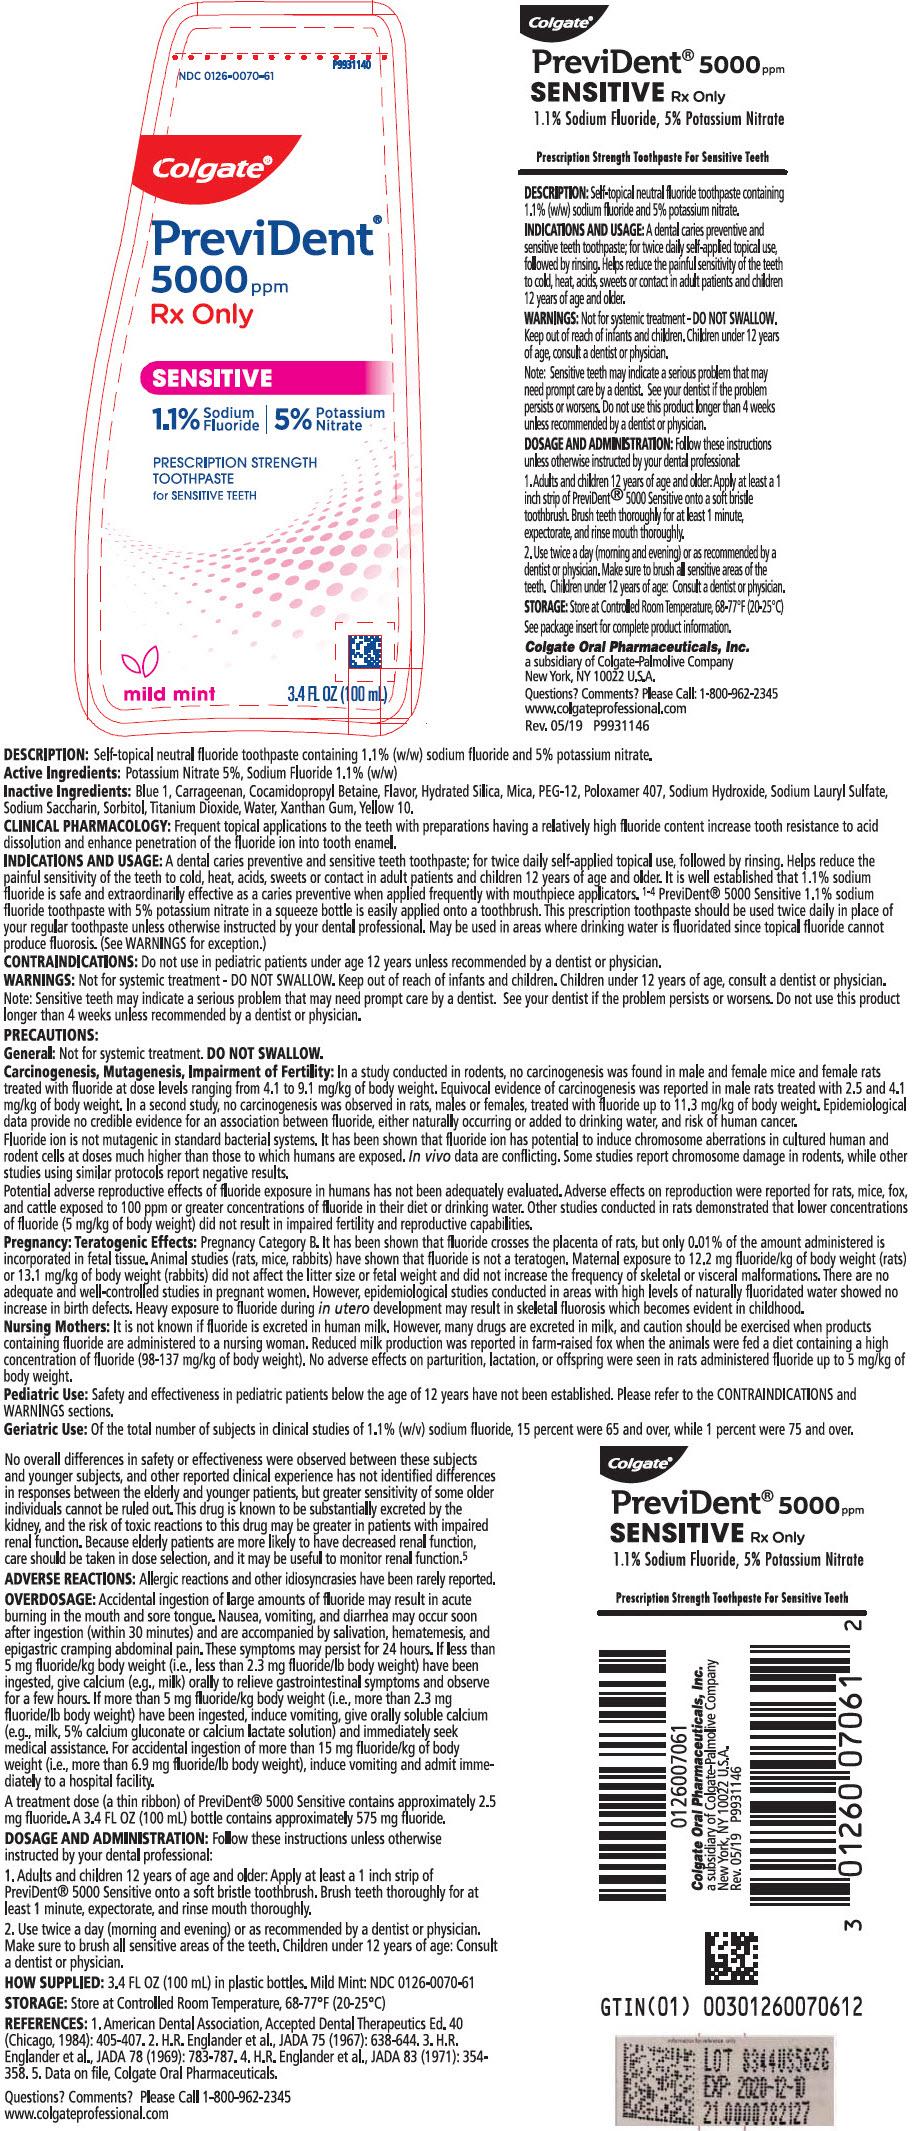 Prevident 5000 Sensitive (Sodium Fluoride) Gel, Dentifrice [Colgate-palmolive Company]